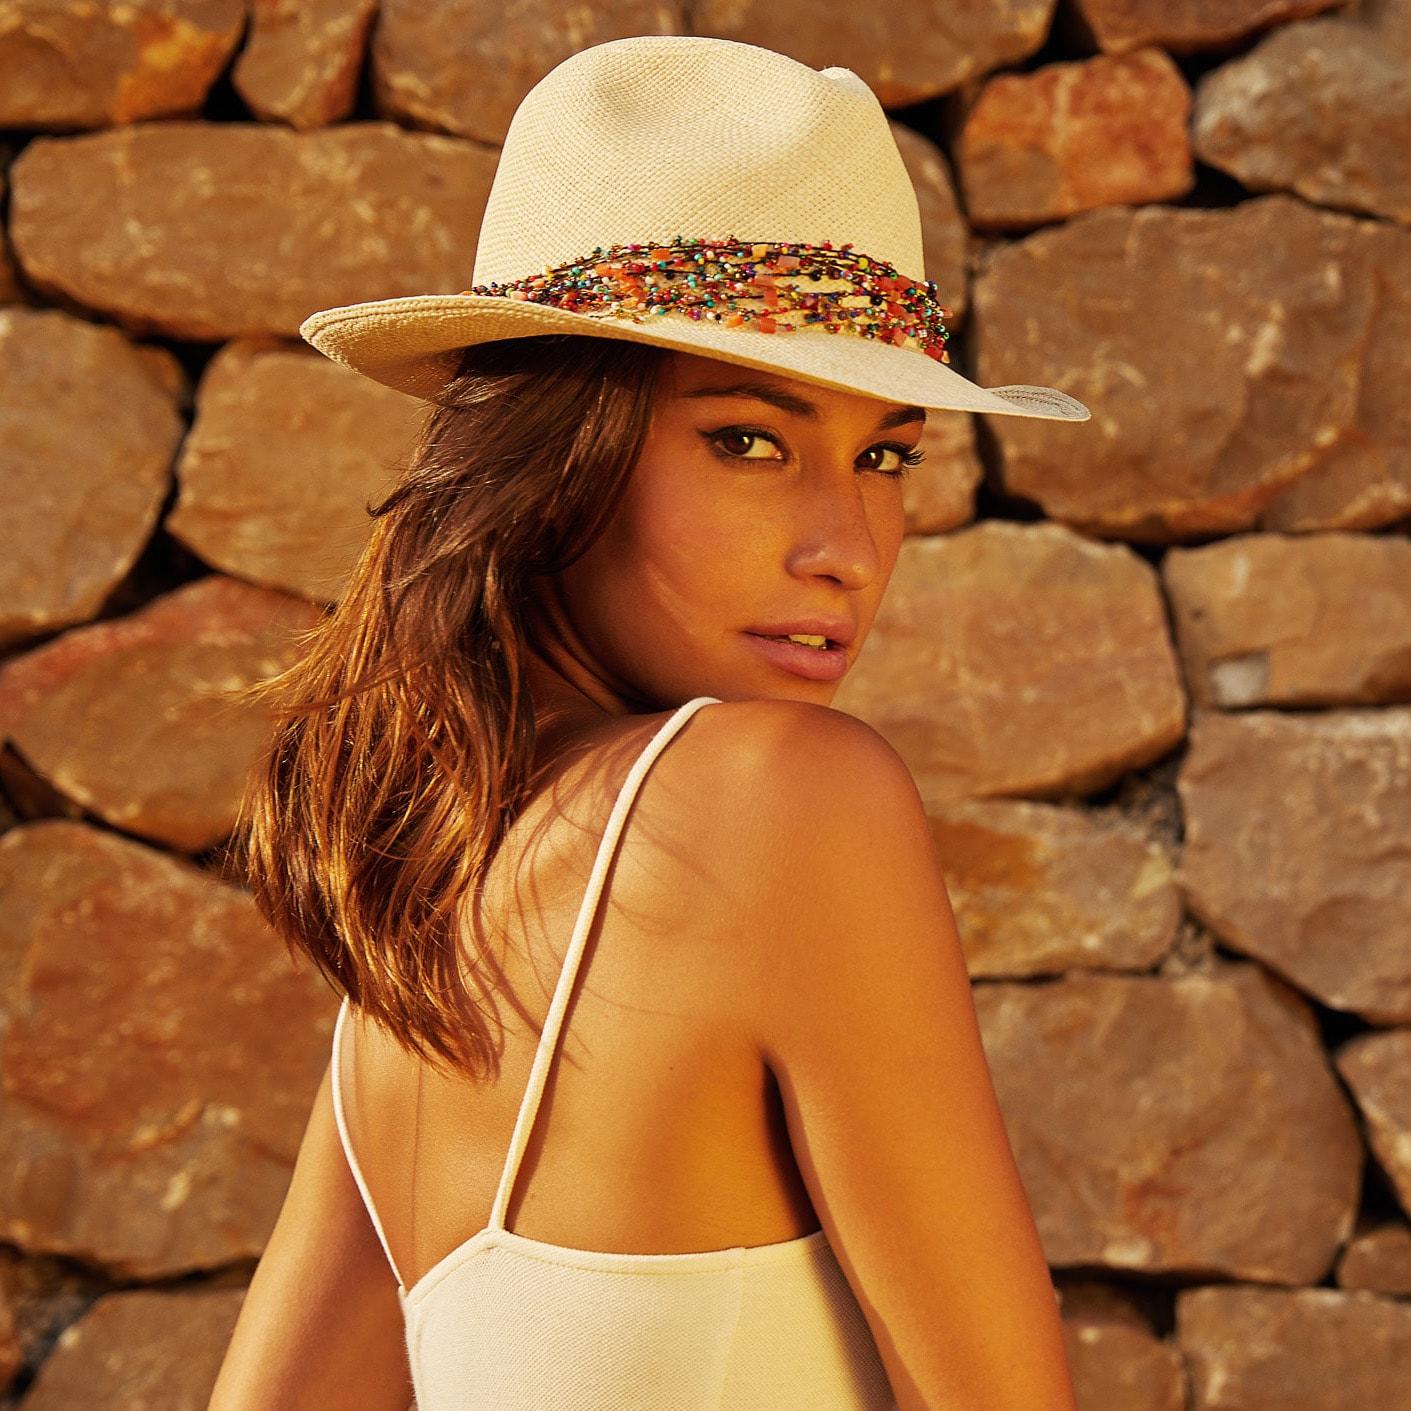 square-calypso-fiesta-women-wearing-pachacuti-panama-hat-0050-photoshoot